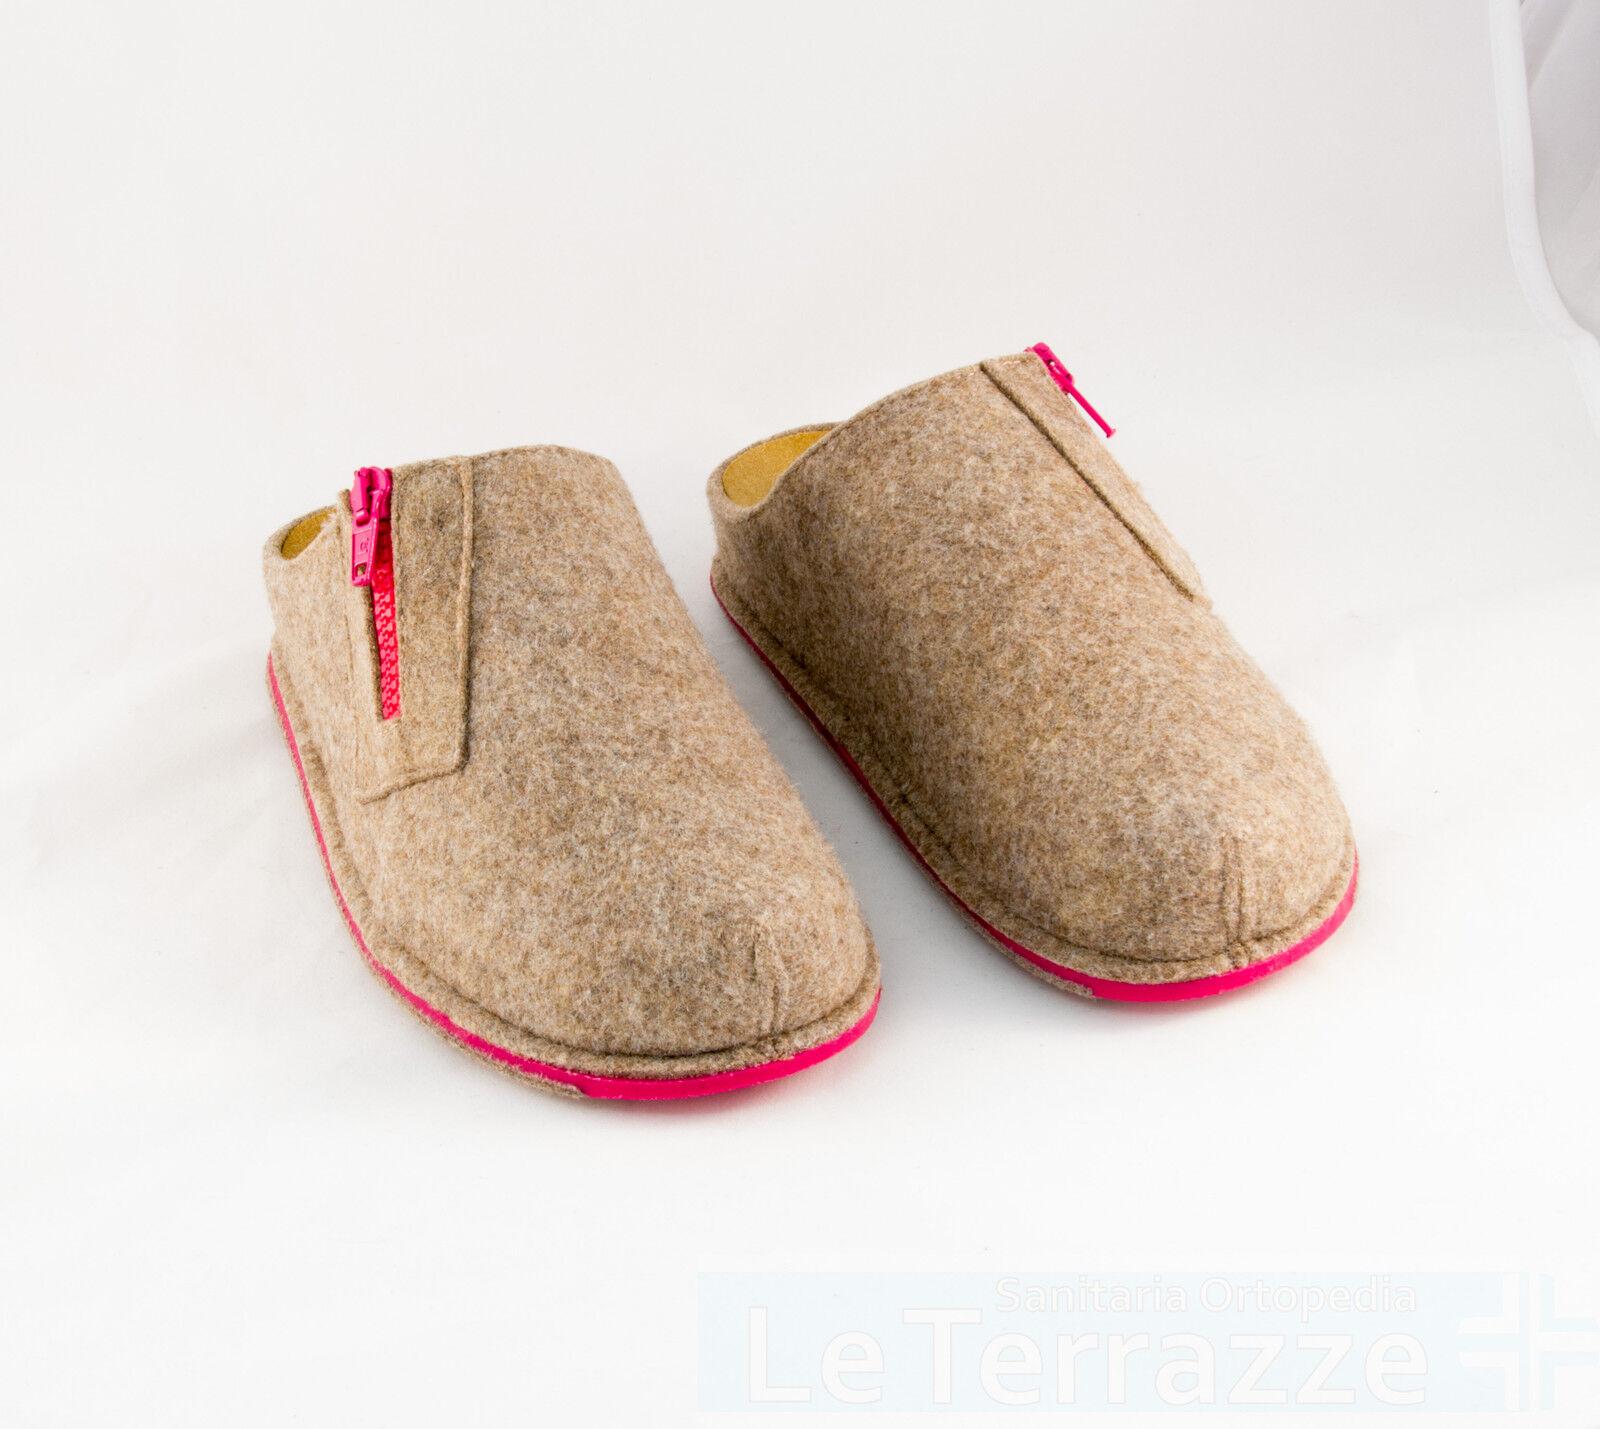 Dr Scholl SPIKEY 3 ciabatte pantofole con PLANTARE REMOVIBILE Bioprint